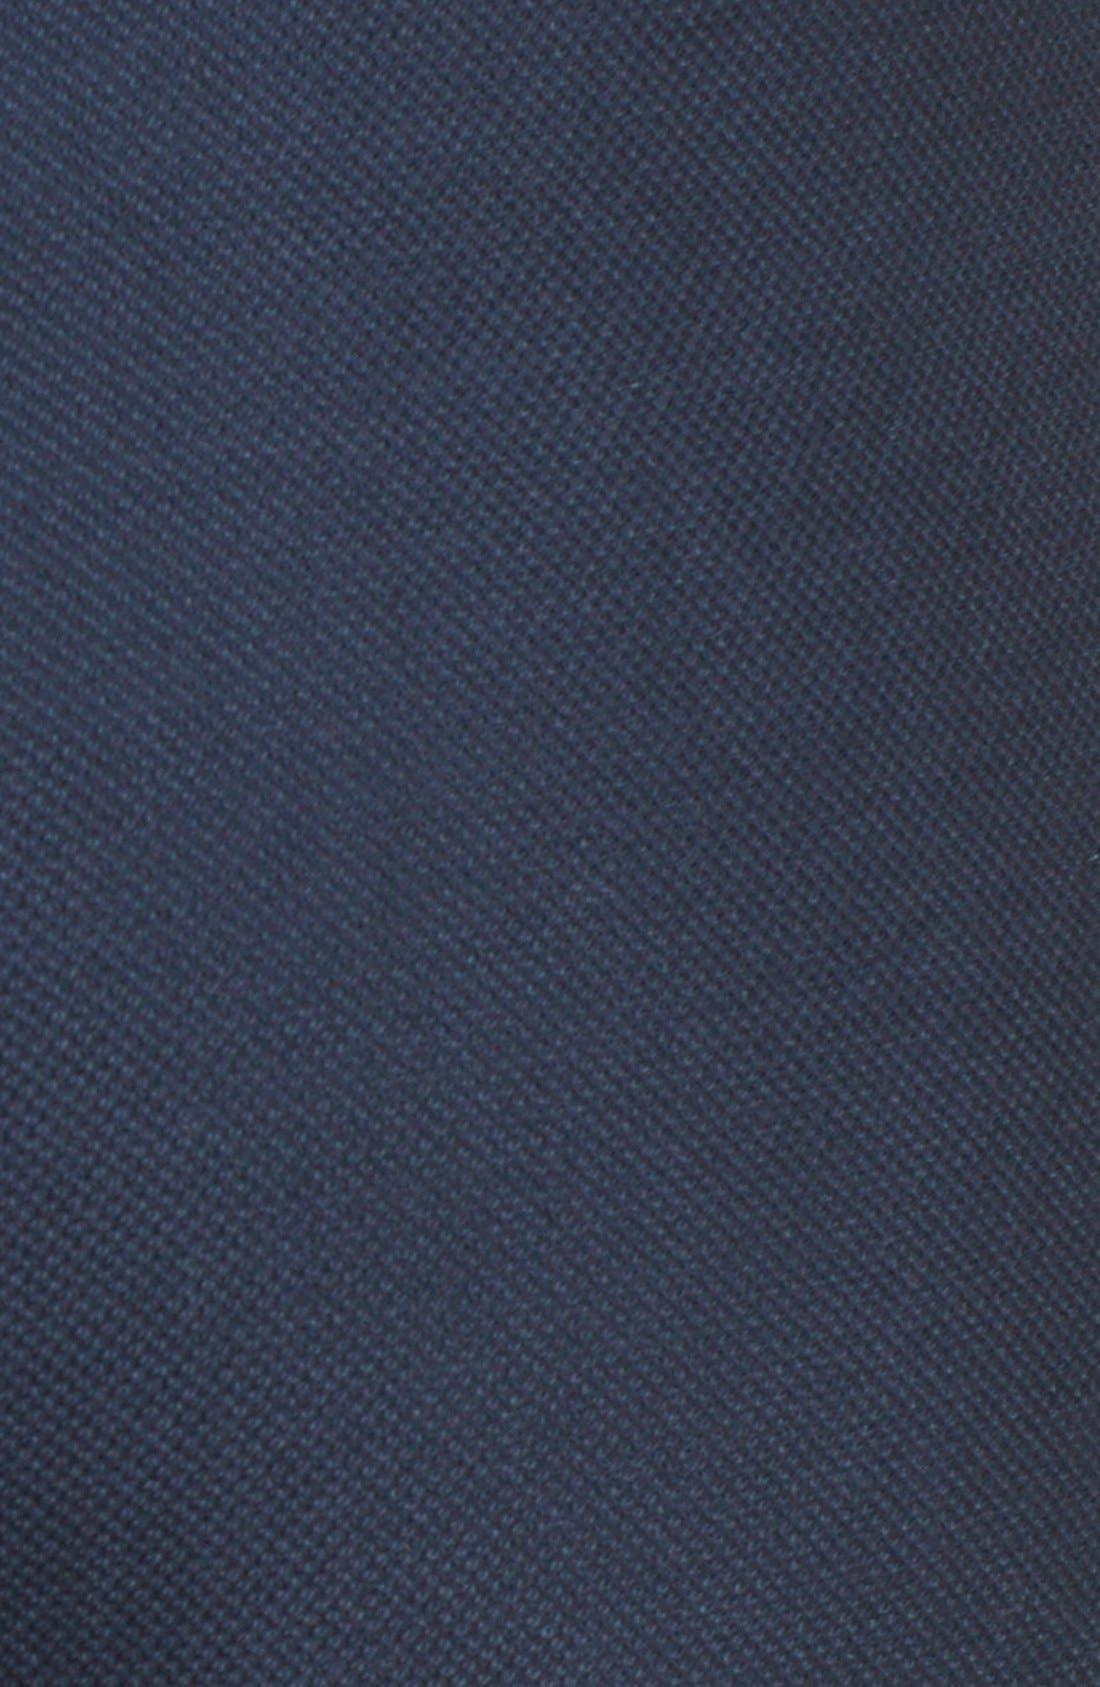 Alternate Image 3  - Nordstrom Signature and Caroline Issa 'Raindrop' Slim Cotton Ankle Pants